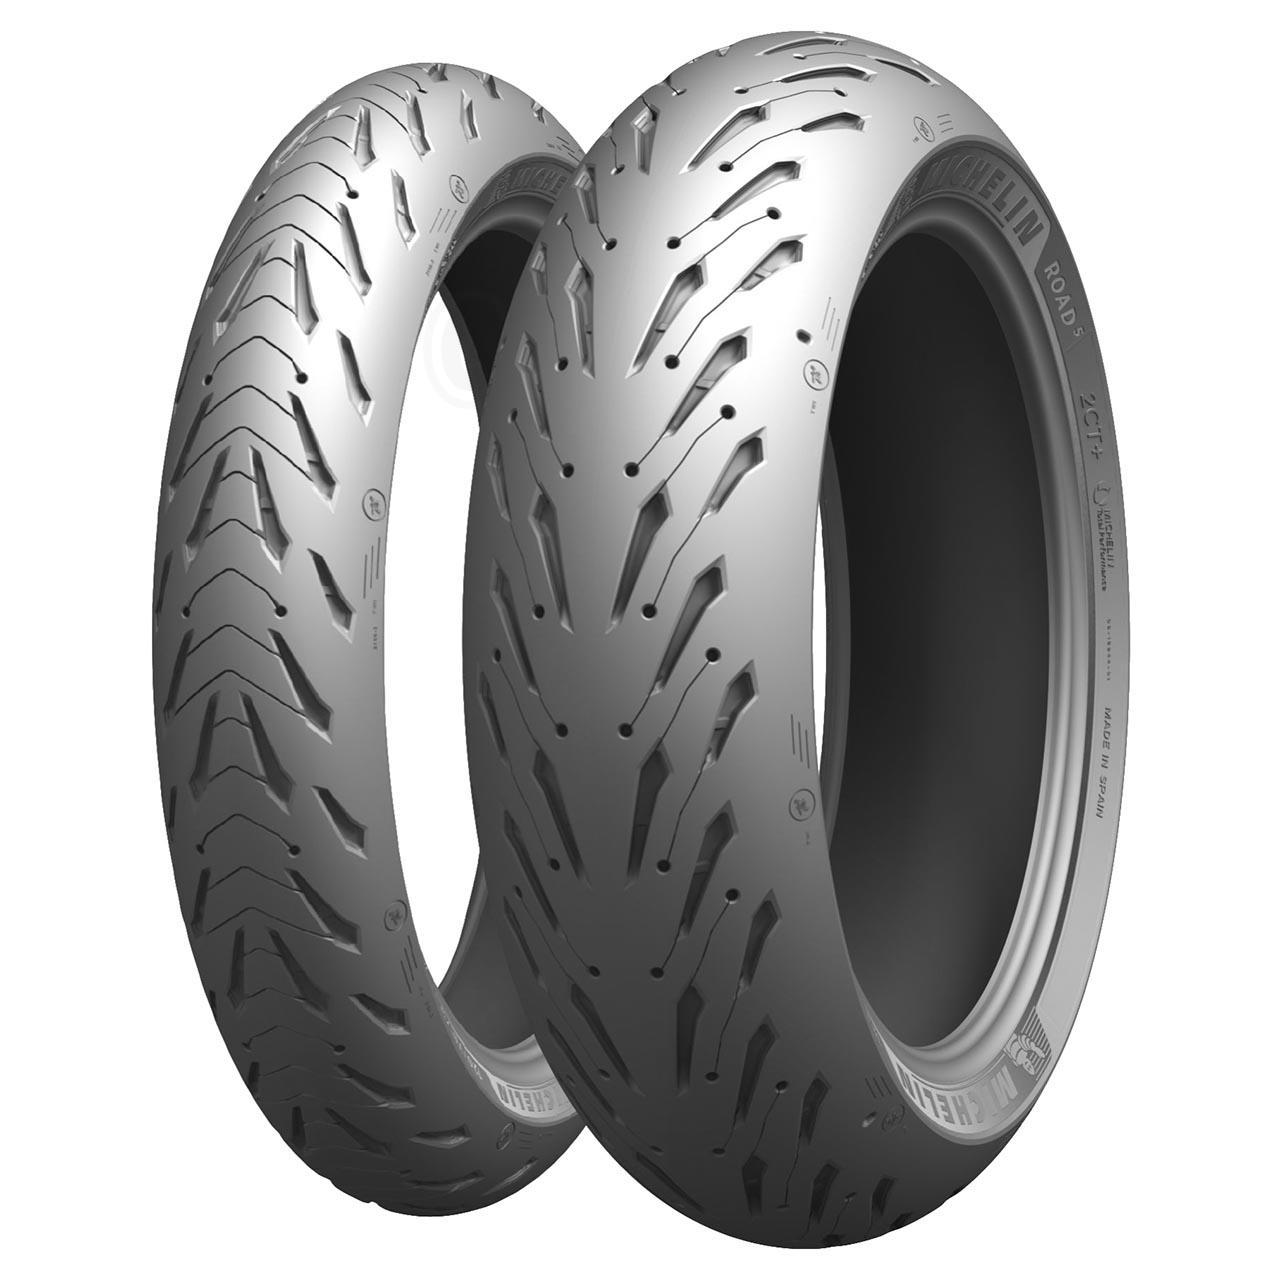 Michelin Road 5 GT RT 190/50ZR17 (73W) TL